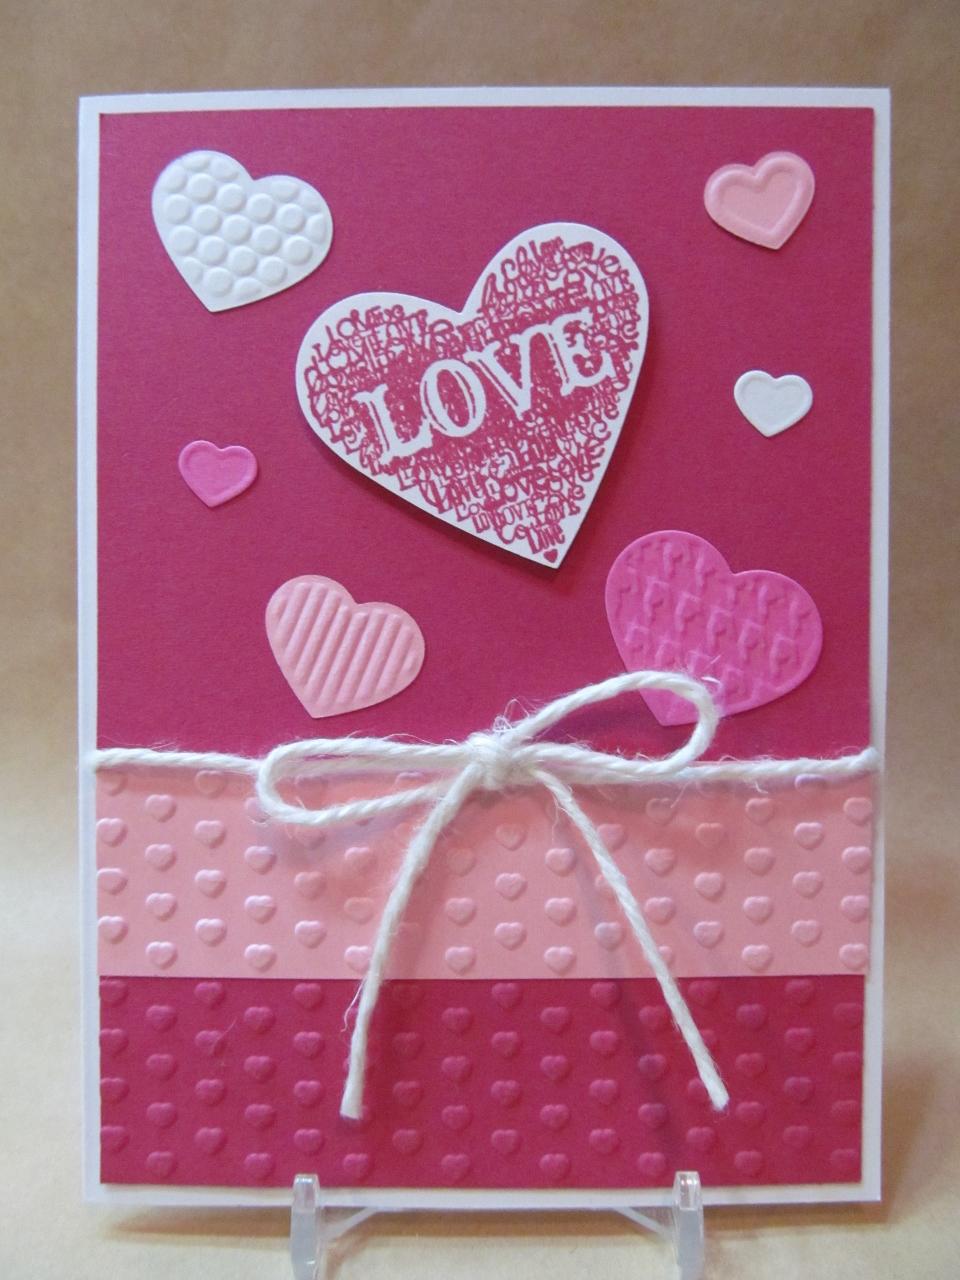 Savvy Handmade Cards: Embossed LOVE Card